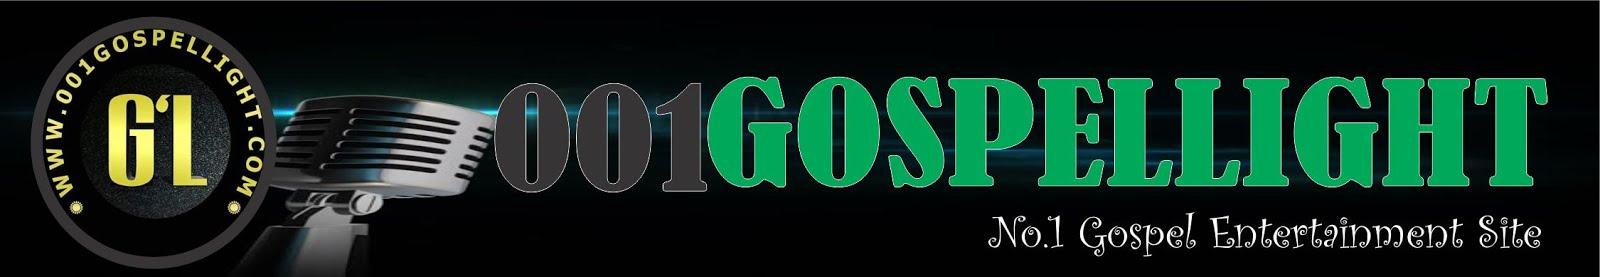 001gospellight